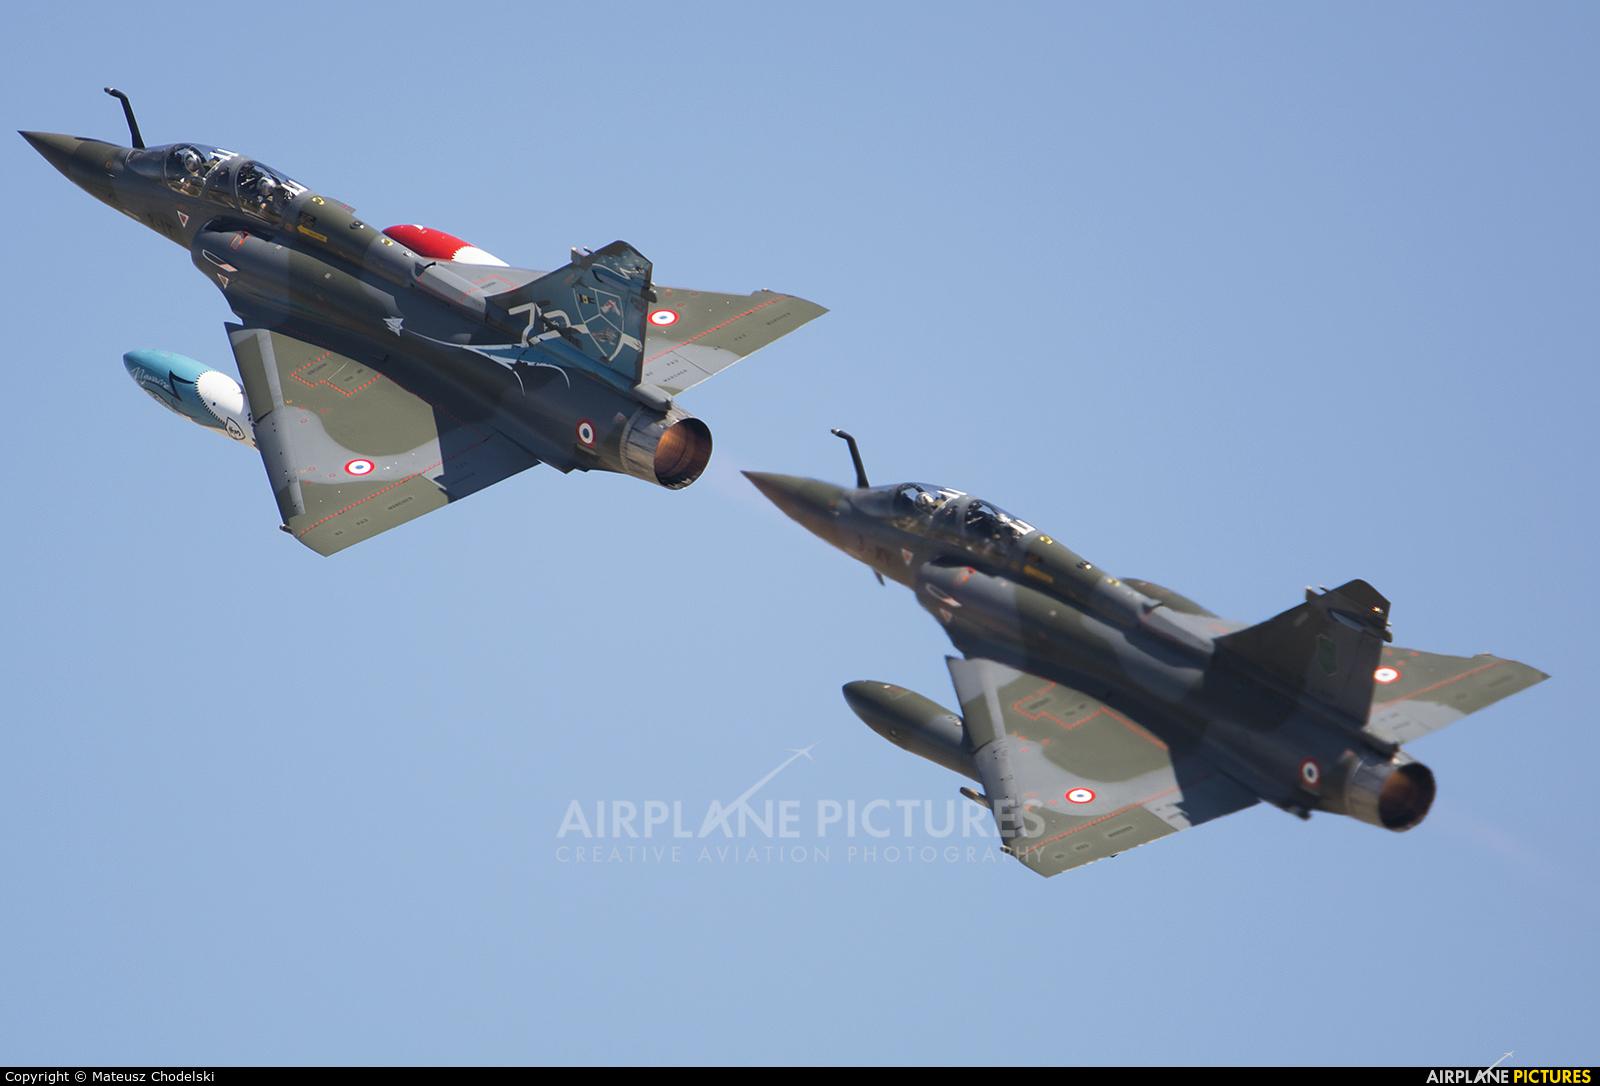 France - Air Force 624 aircraft at Fairford